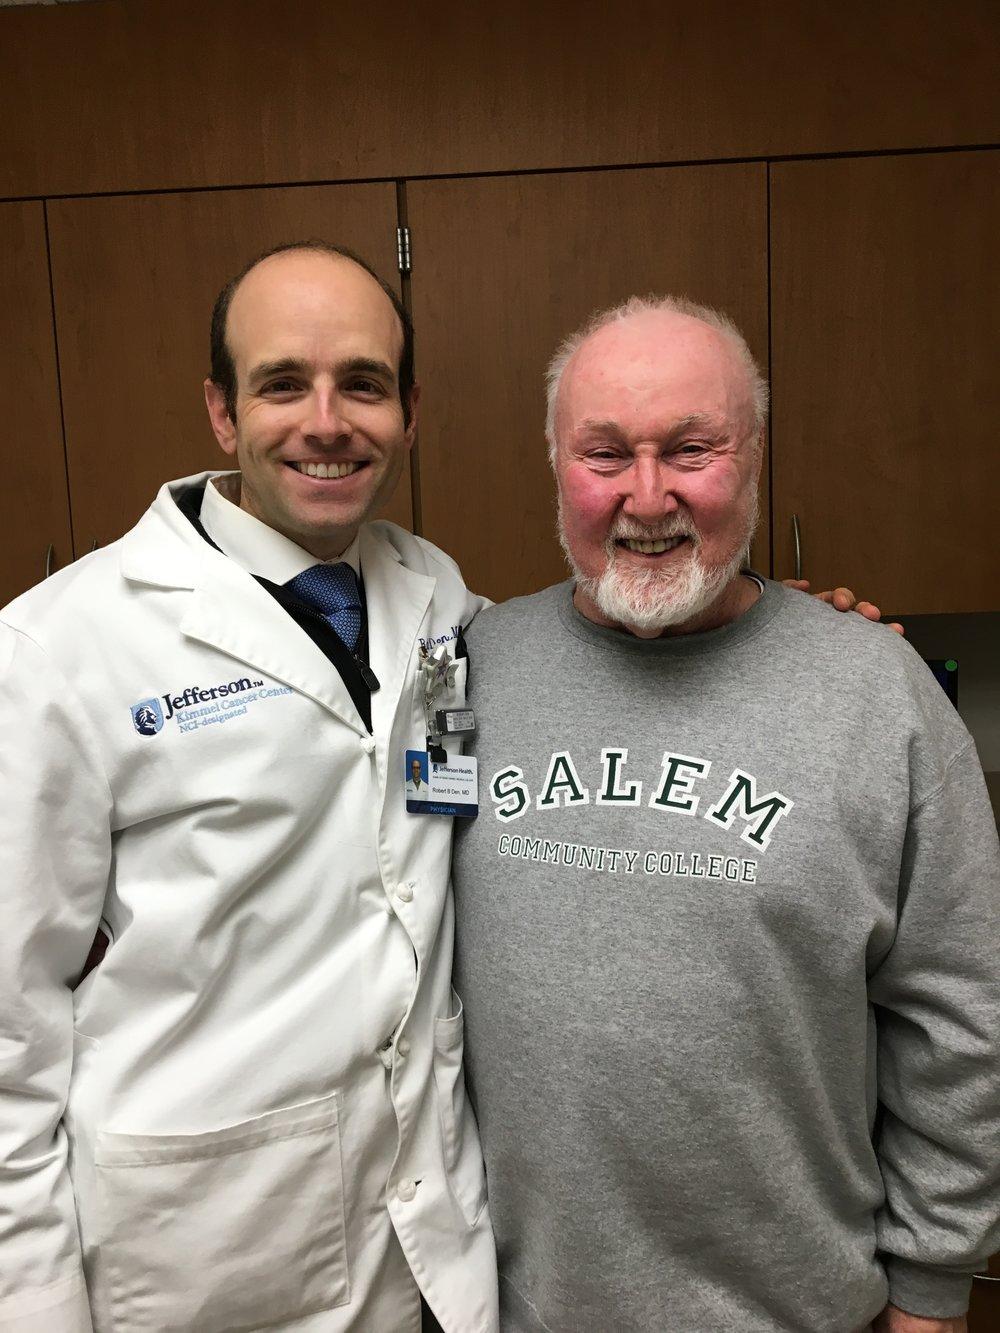 - Dr. Robert B. DenRadiation OncologistThomas Jefferson University Hospital